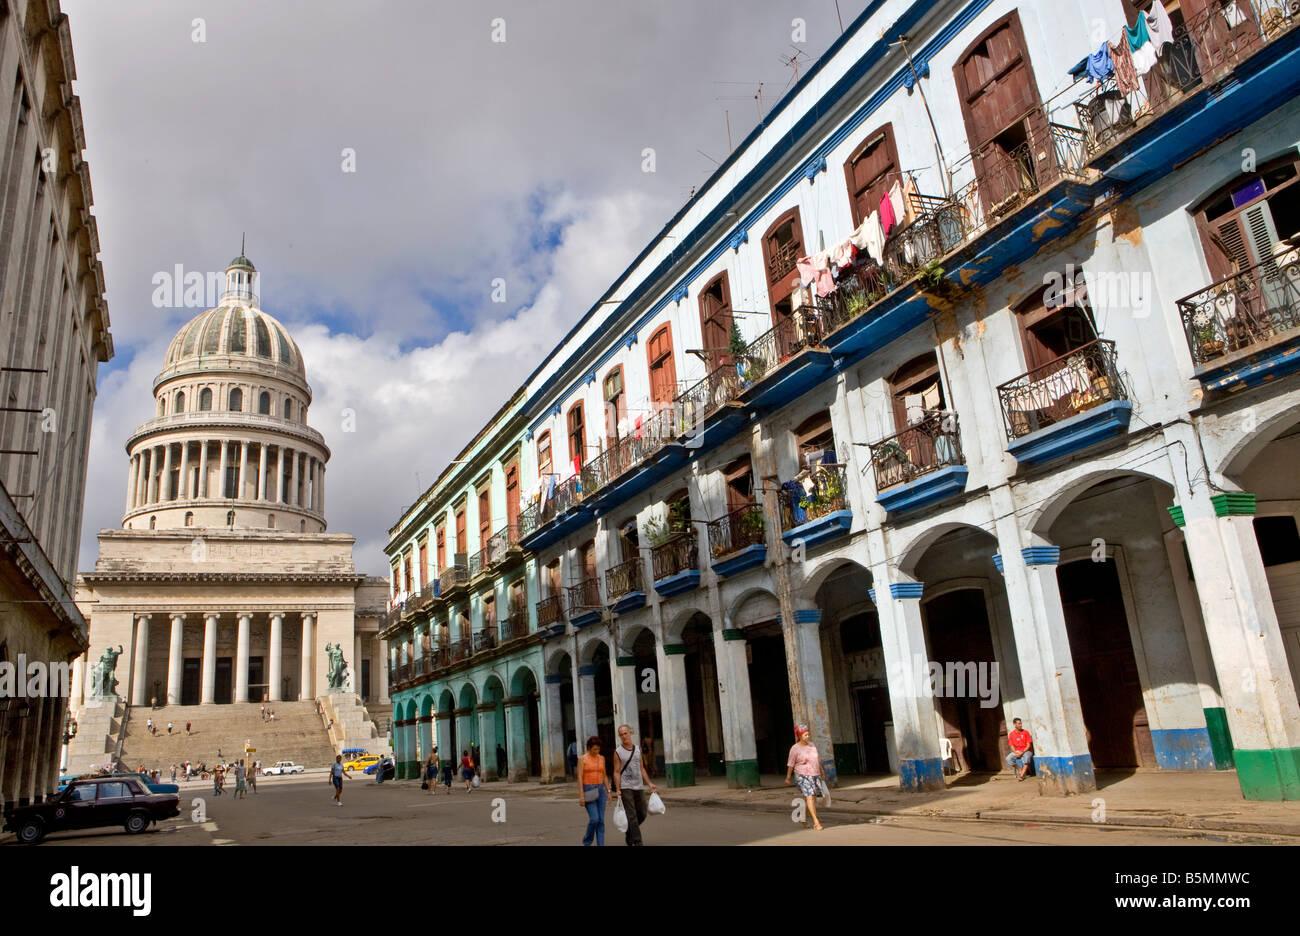 Teniente Rey Street with Capitolio Havana Cuba - Stock Image